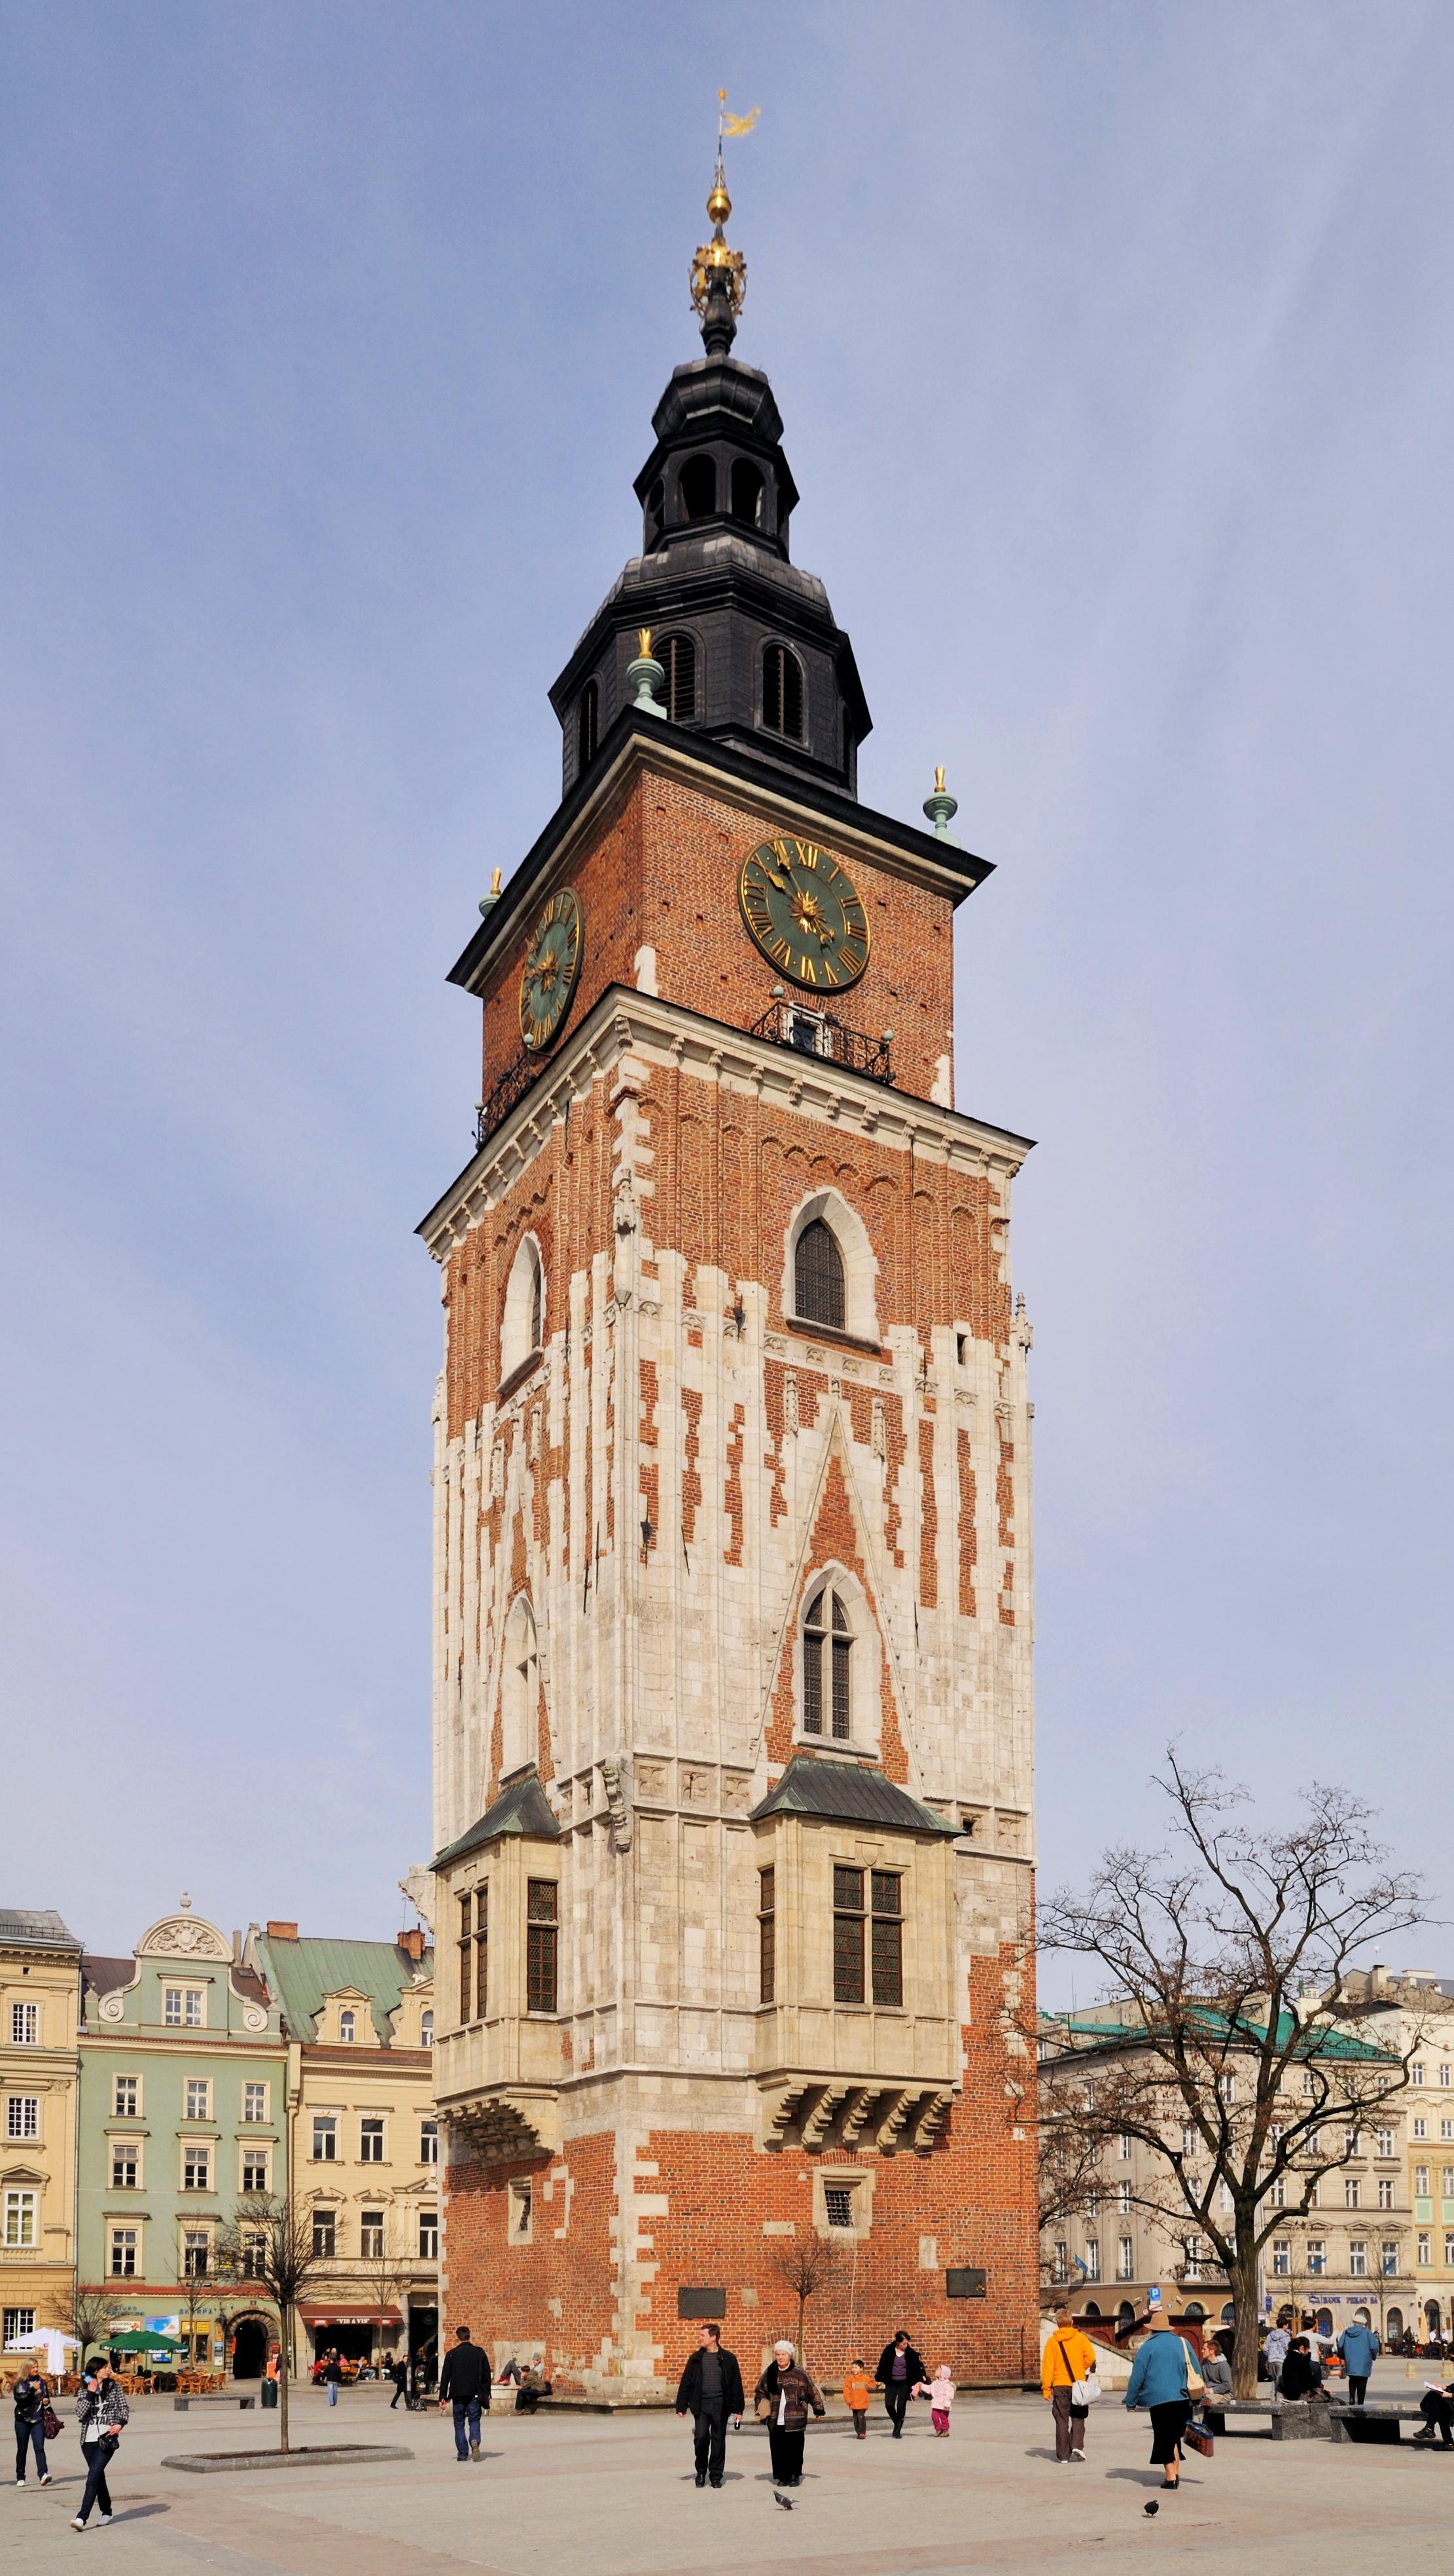 rathausturm wanderfalken regensburg